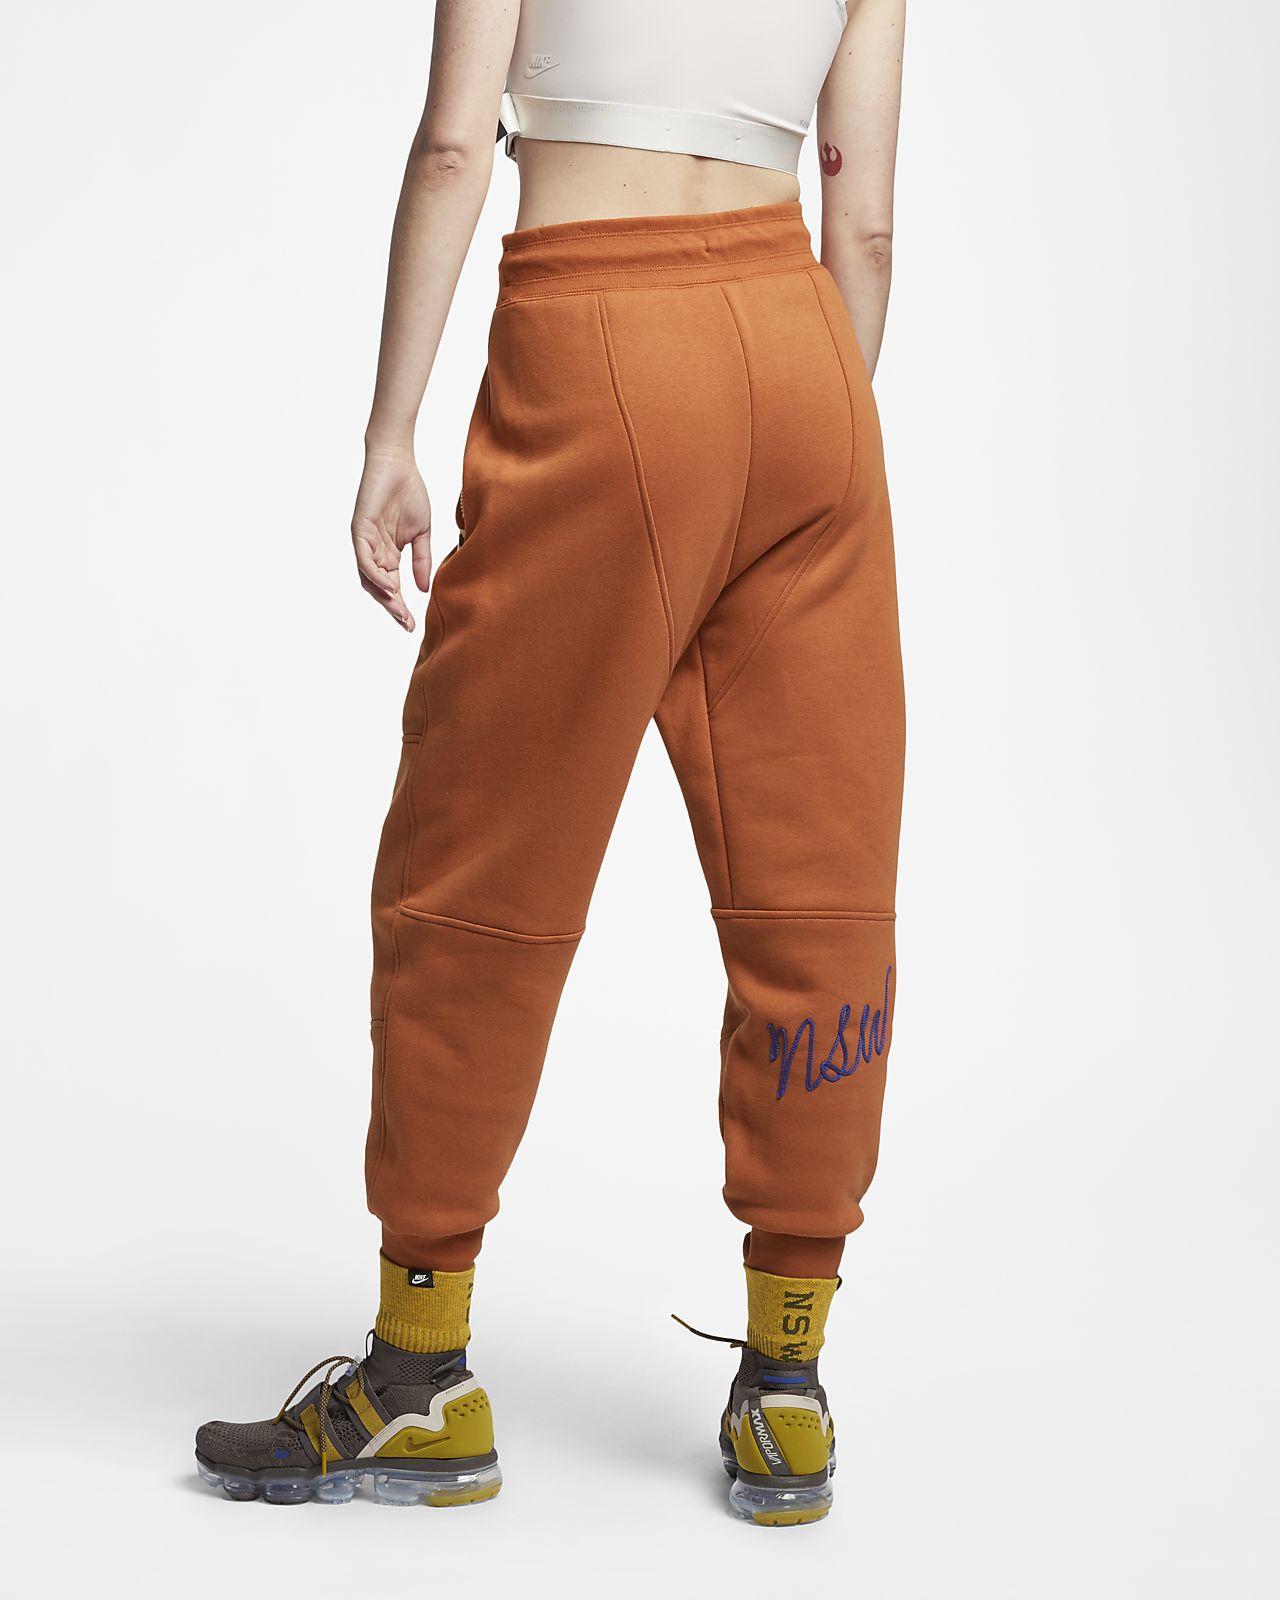 pantalon nike orange femme